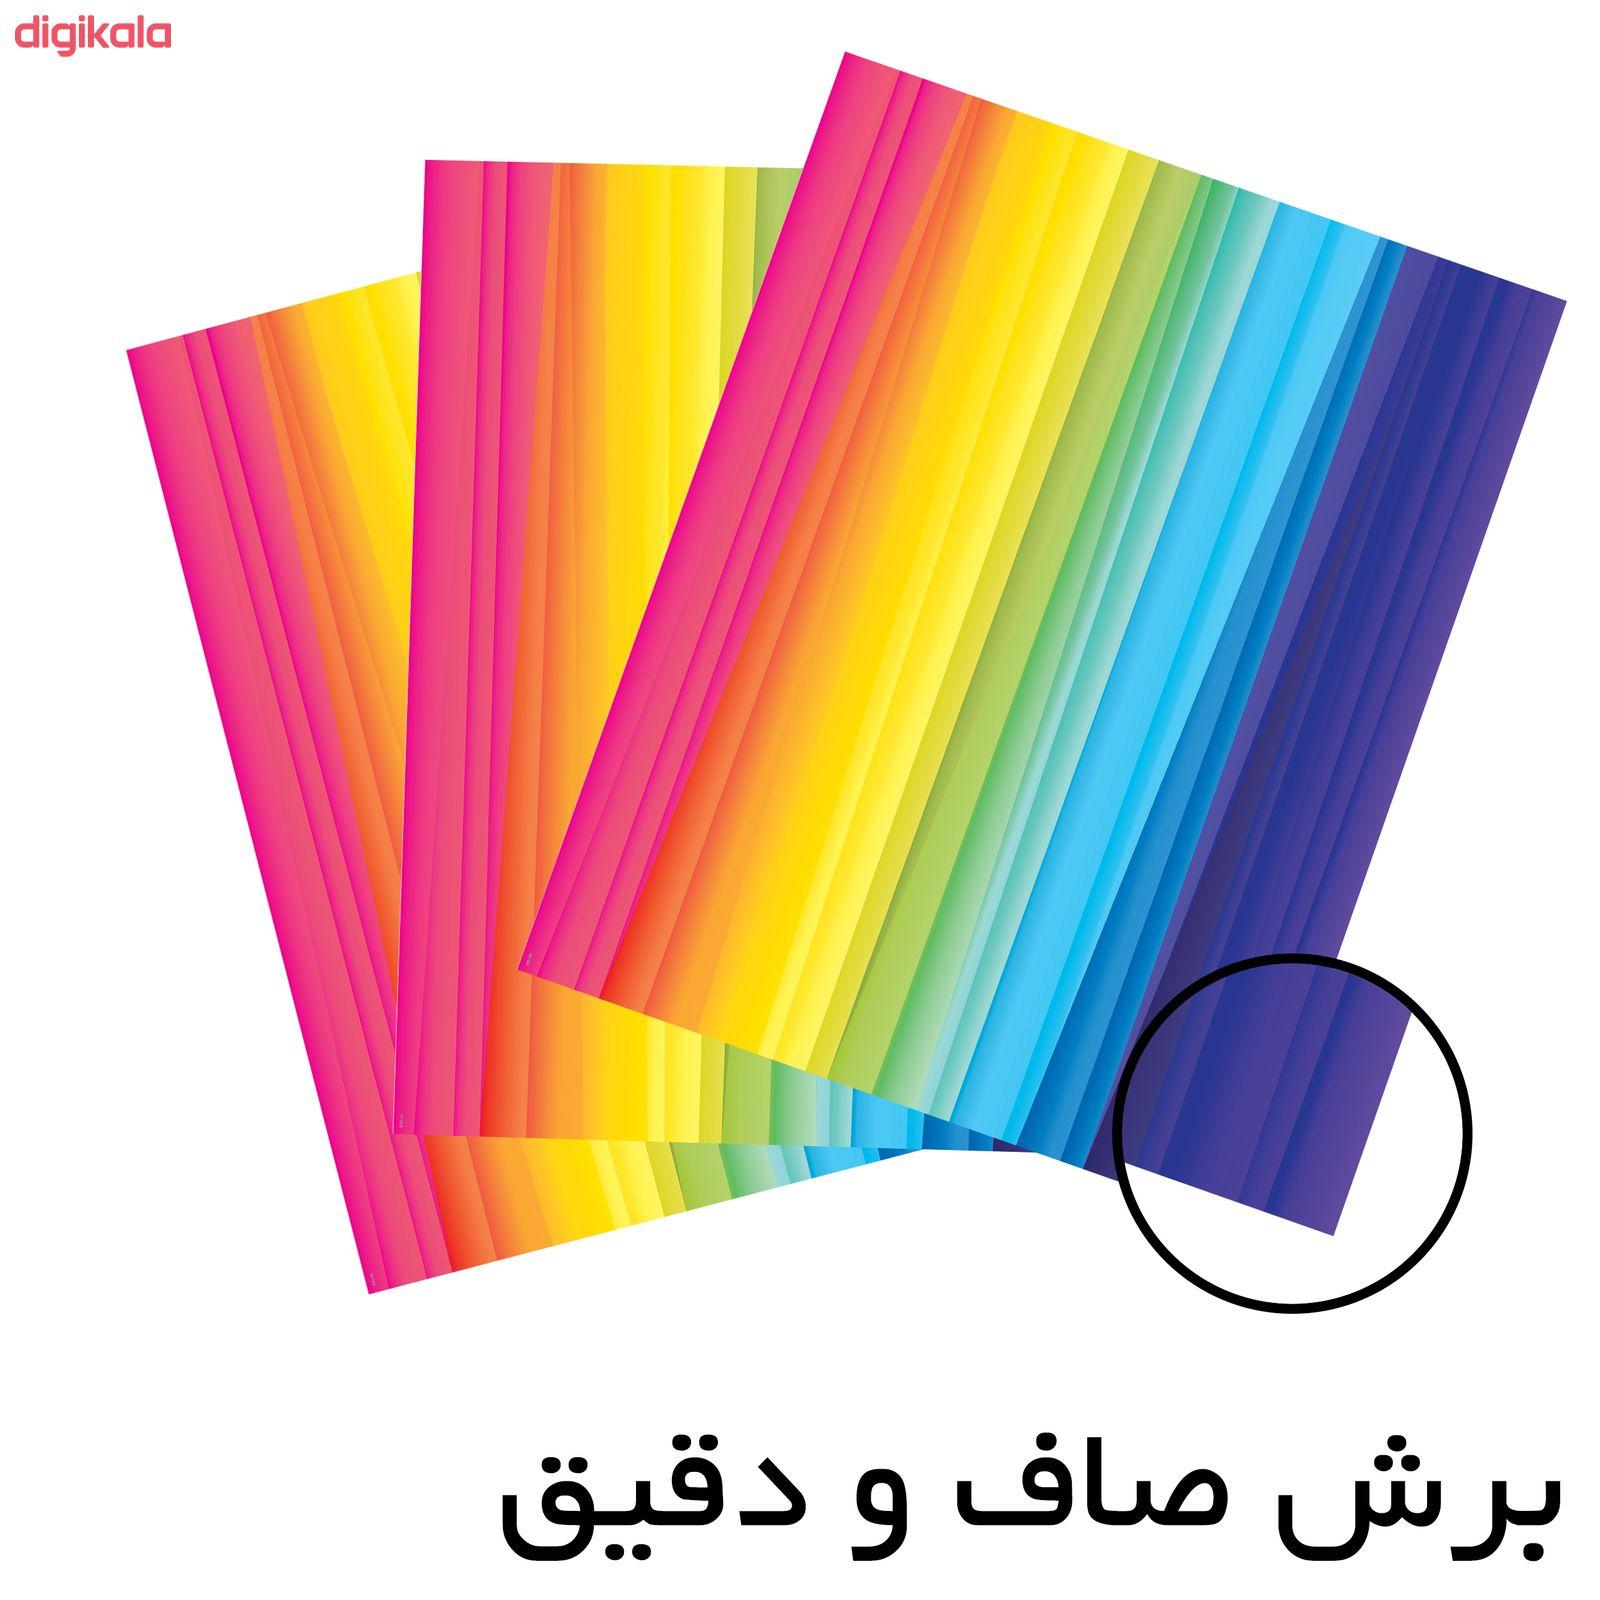 کاغذ رنگی A4 مستر راد مدل رنگارنگ بسته 10 عددی main 1 6